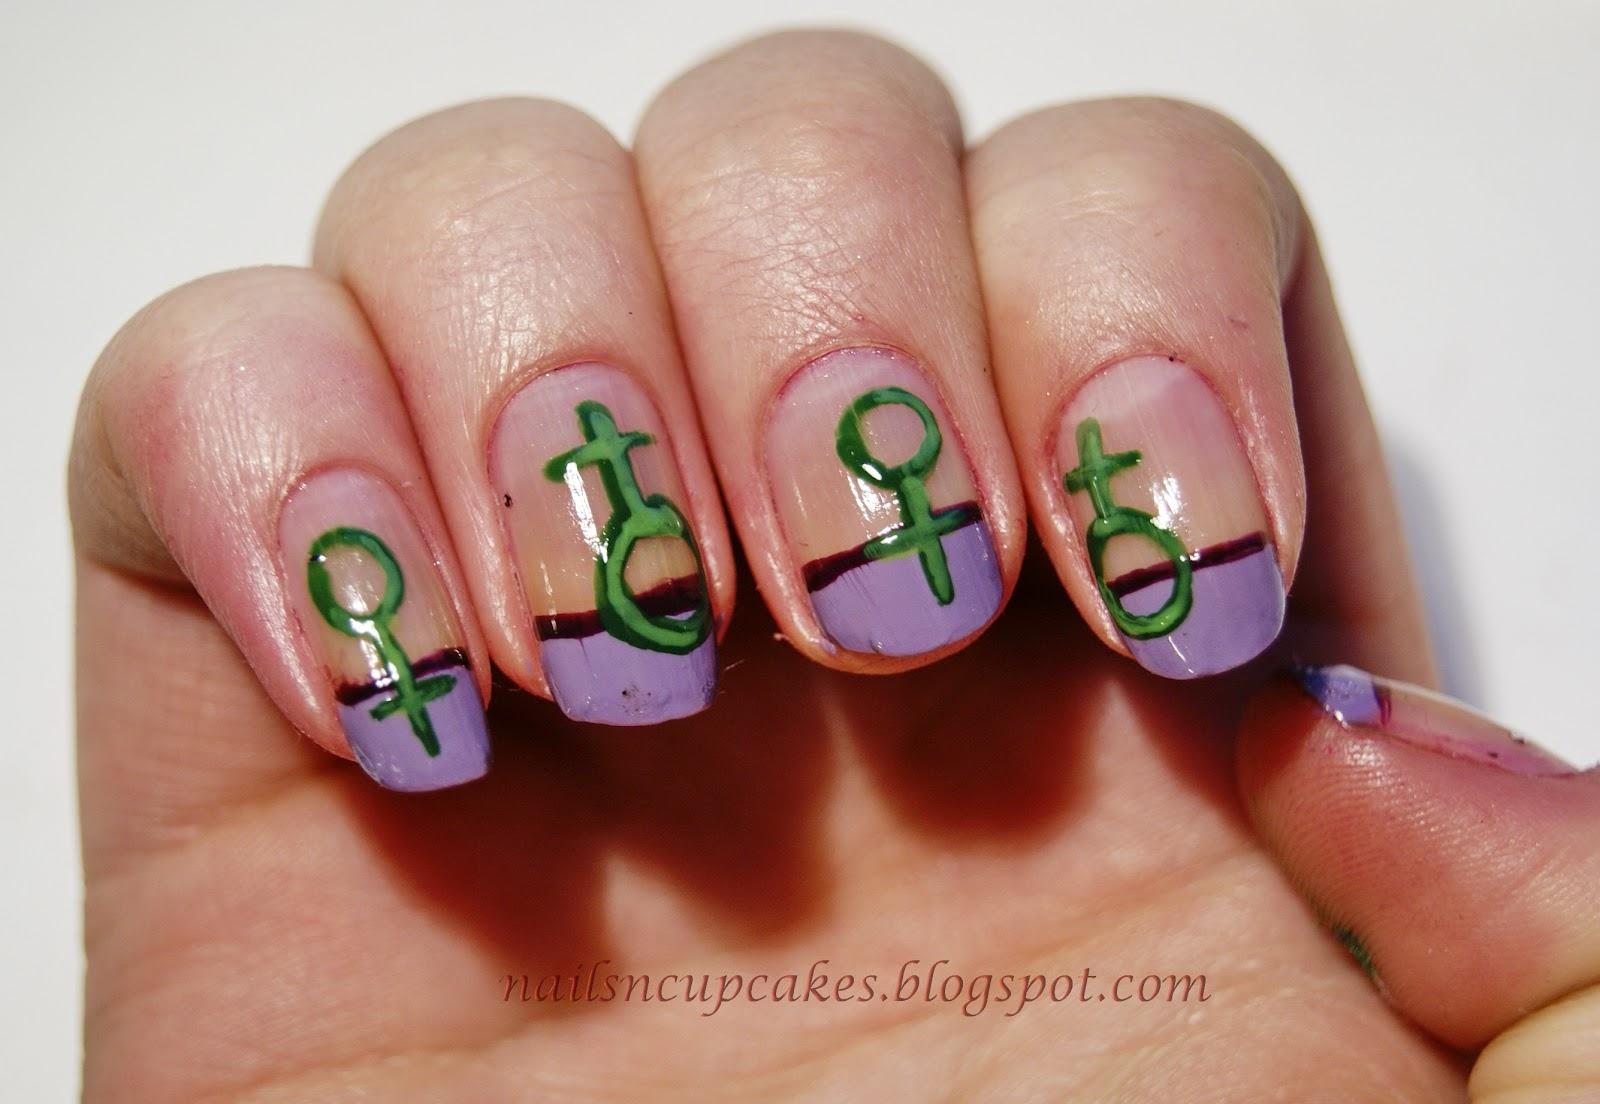 NailsN\'cupcakes: International Women\'s day nails